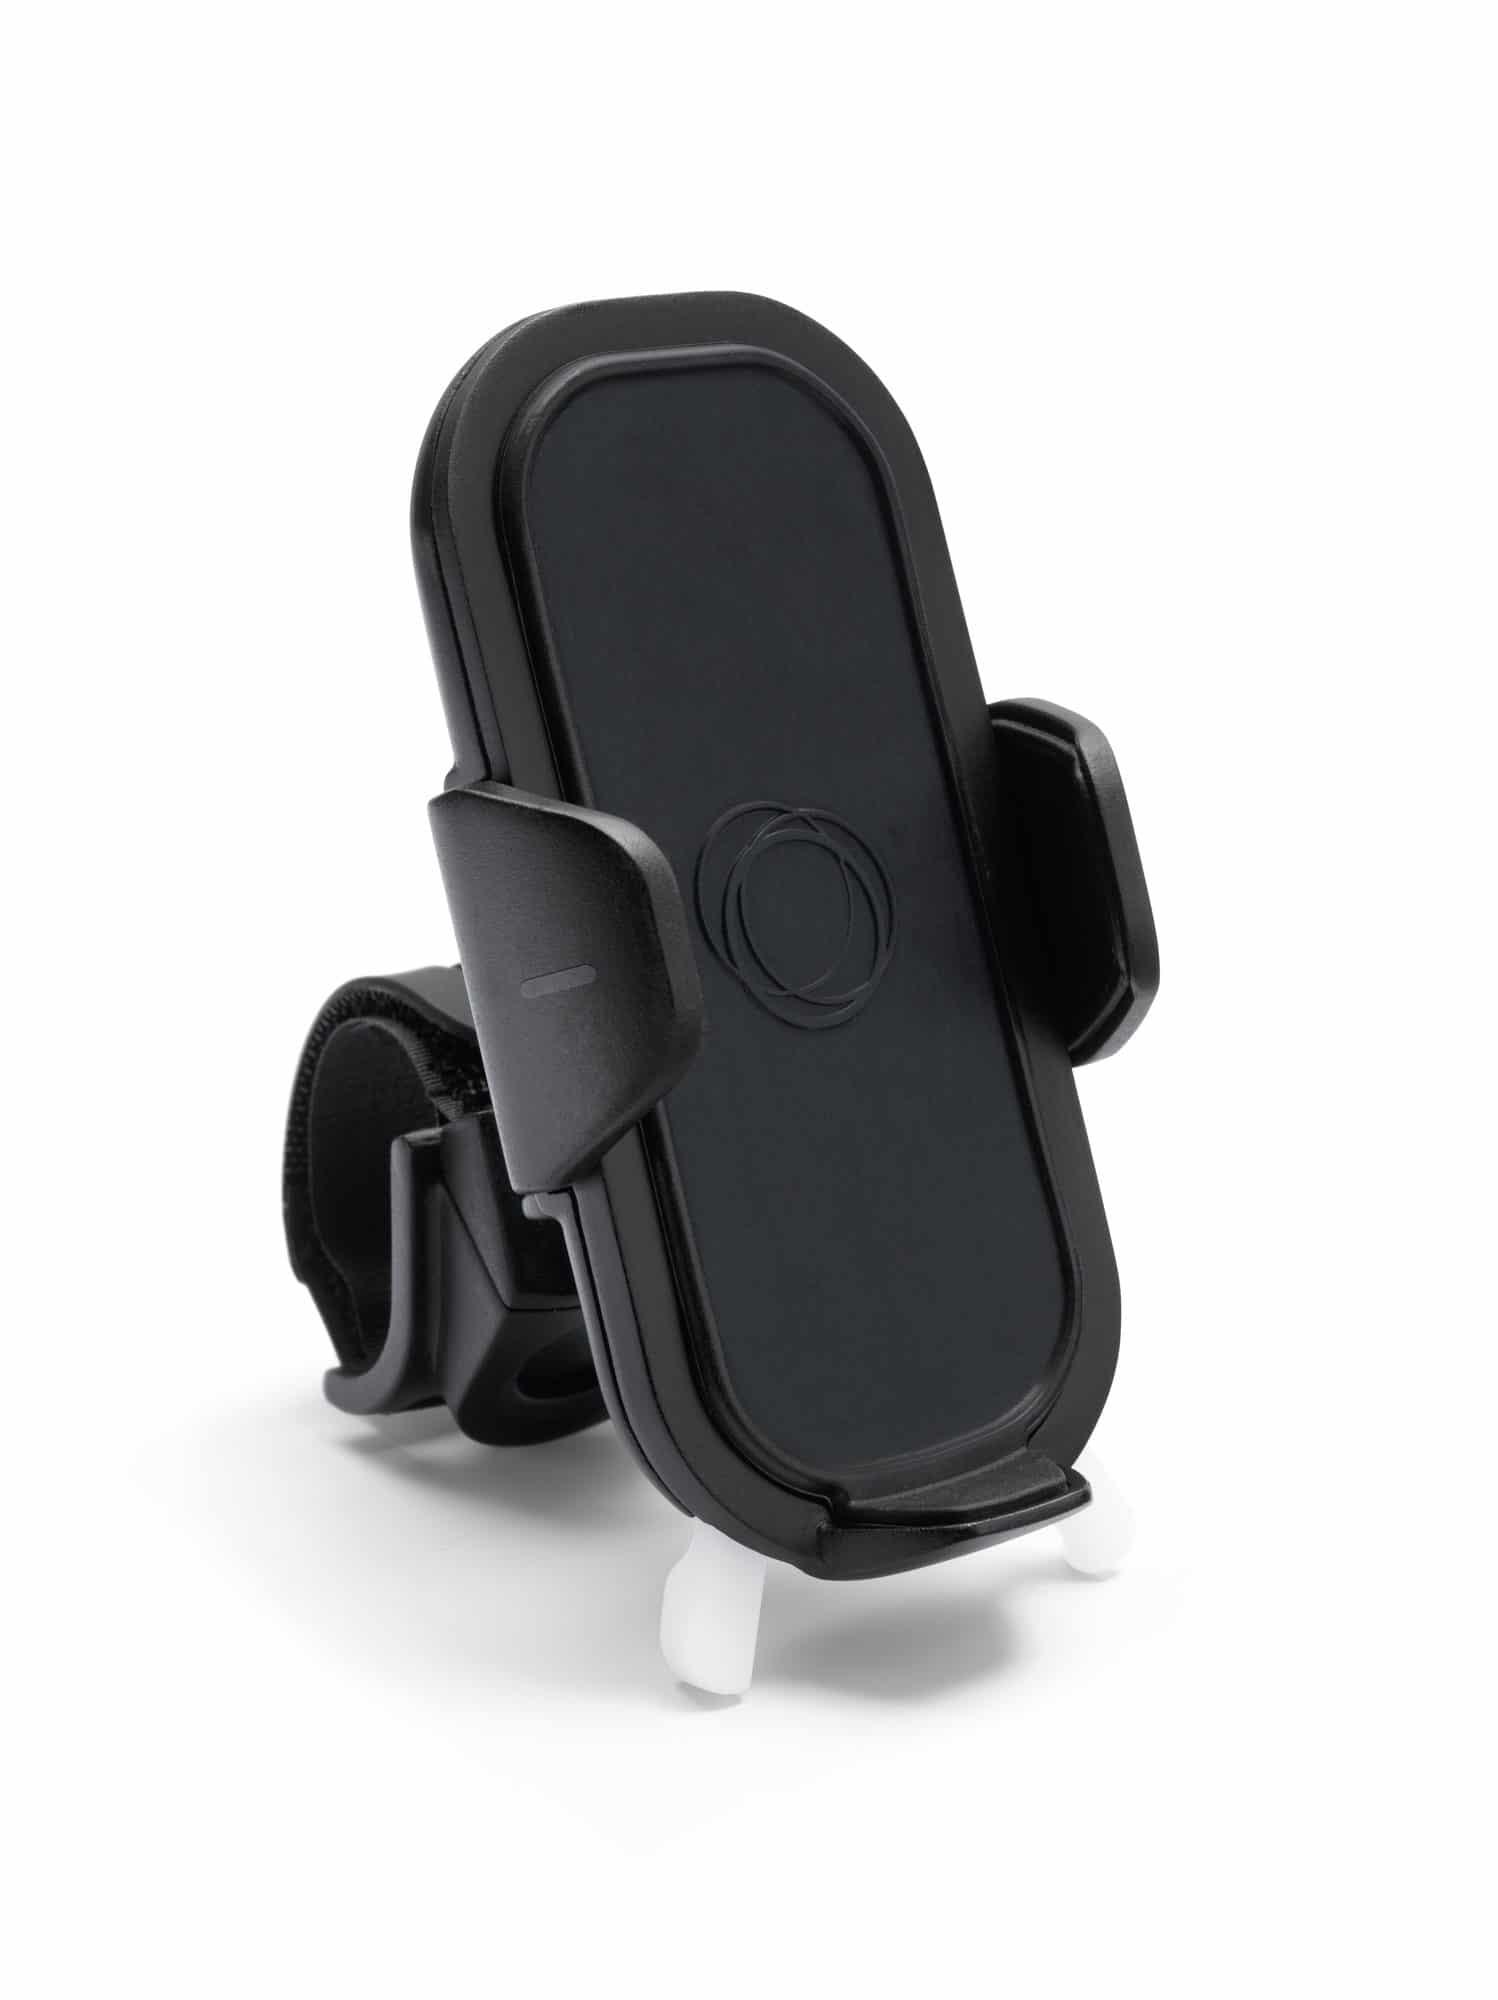 Bugaboo Stroller Holder For Smartphones